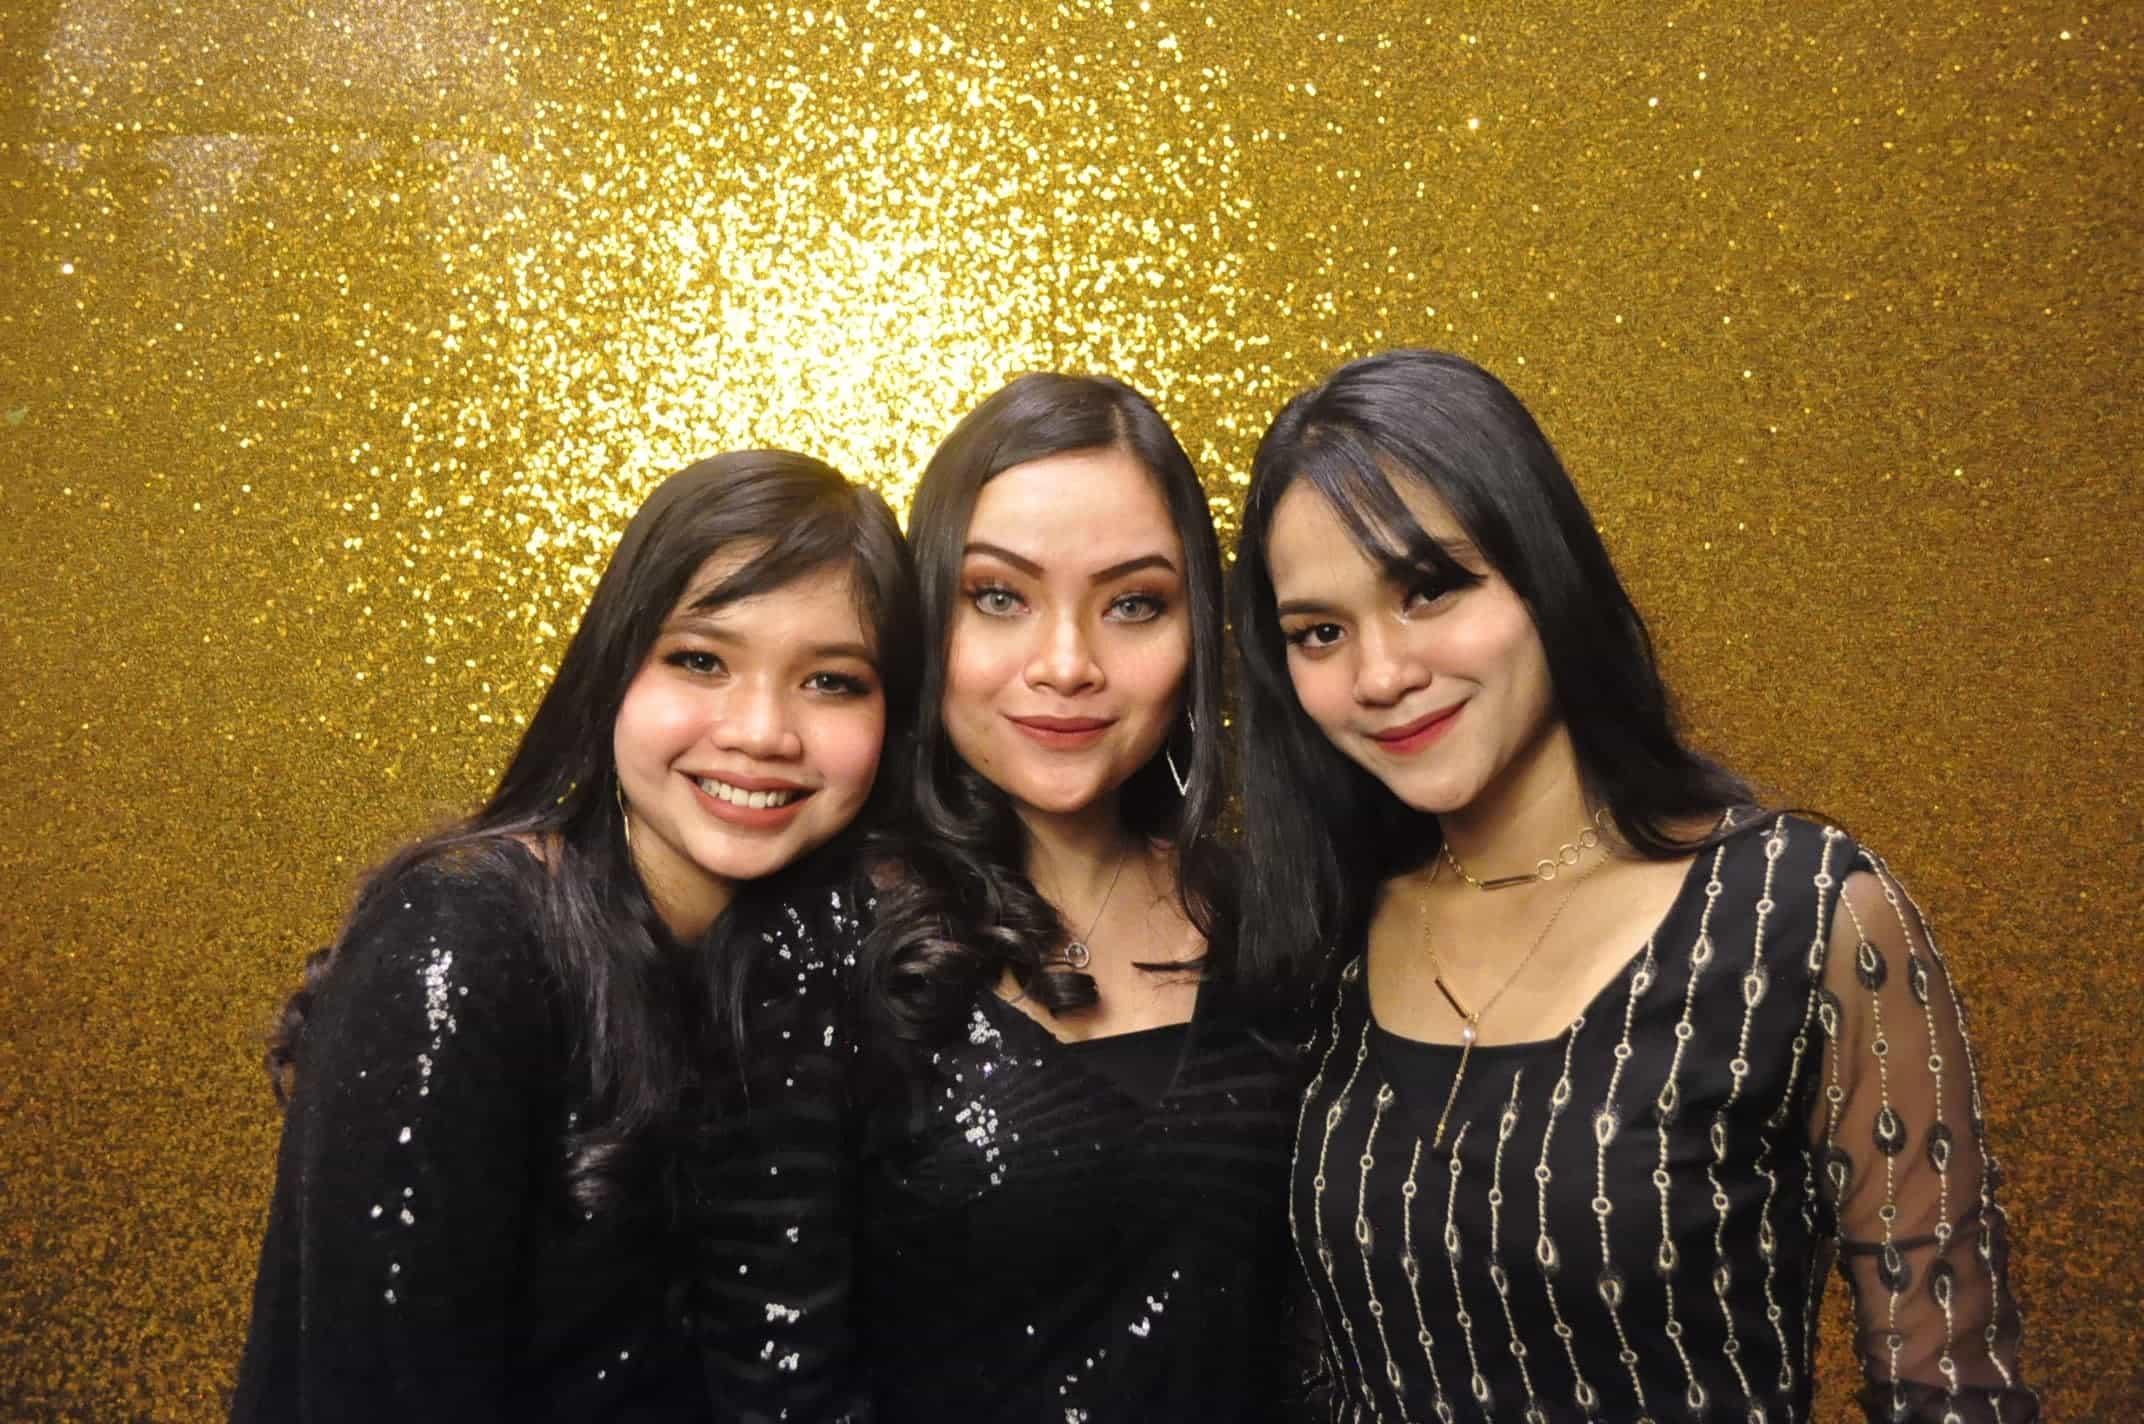 Malam Gala Anggun 2018 (Photobooth) 19